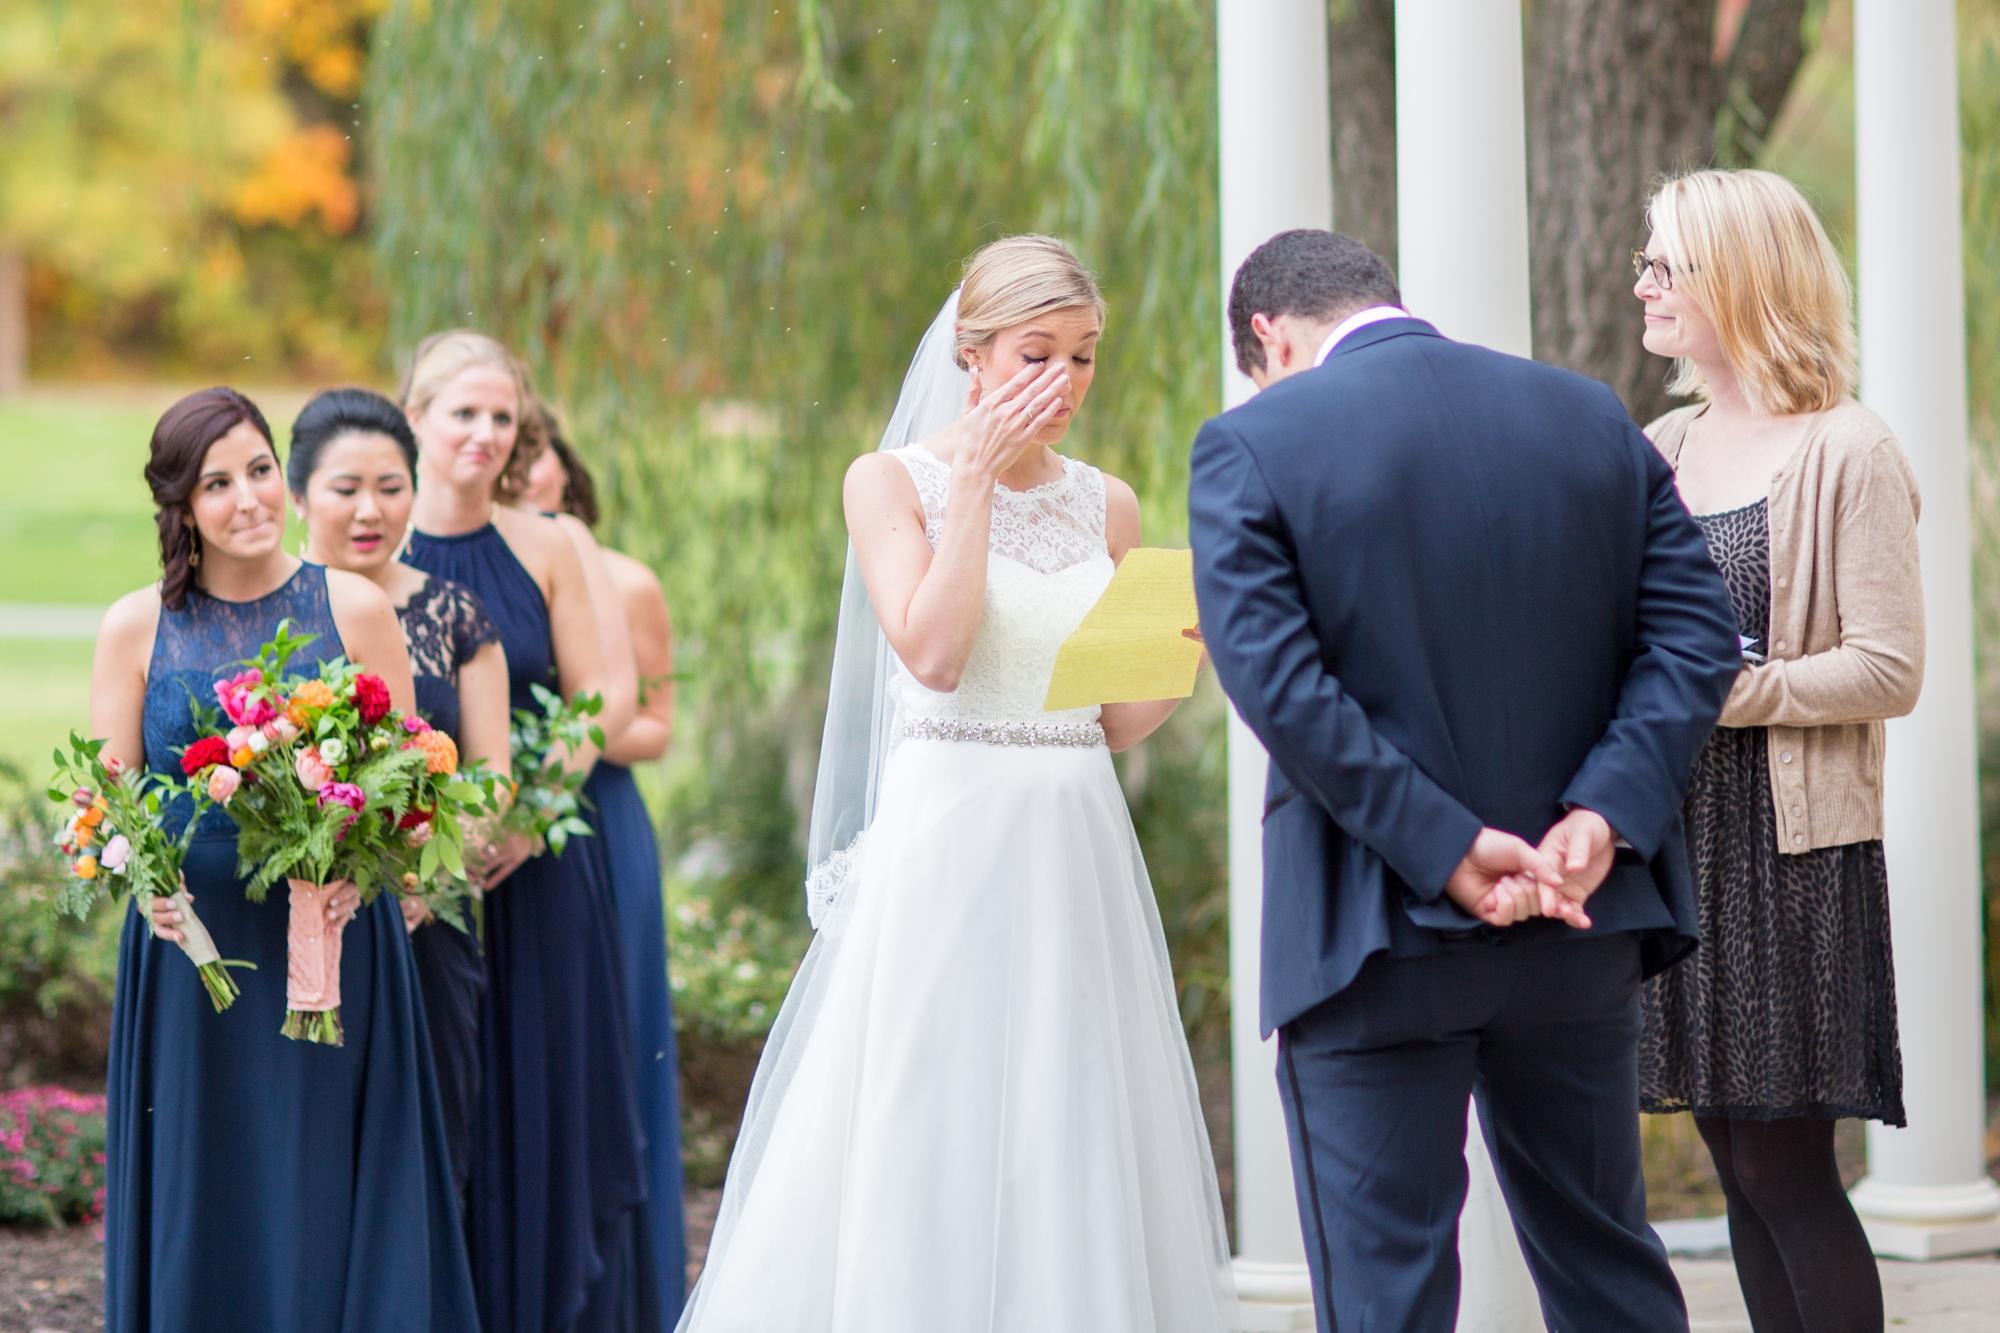 5-Finkel Wedding Ceremony-655_anna grace photography maryland wedding photographer turf valley.jpg